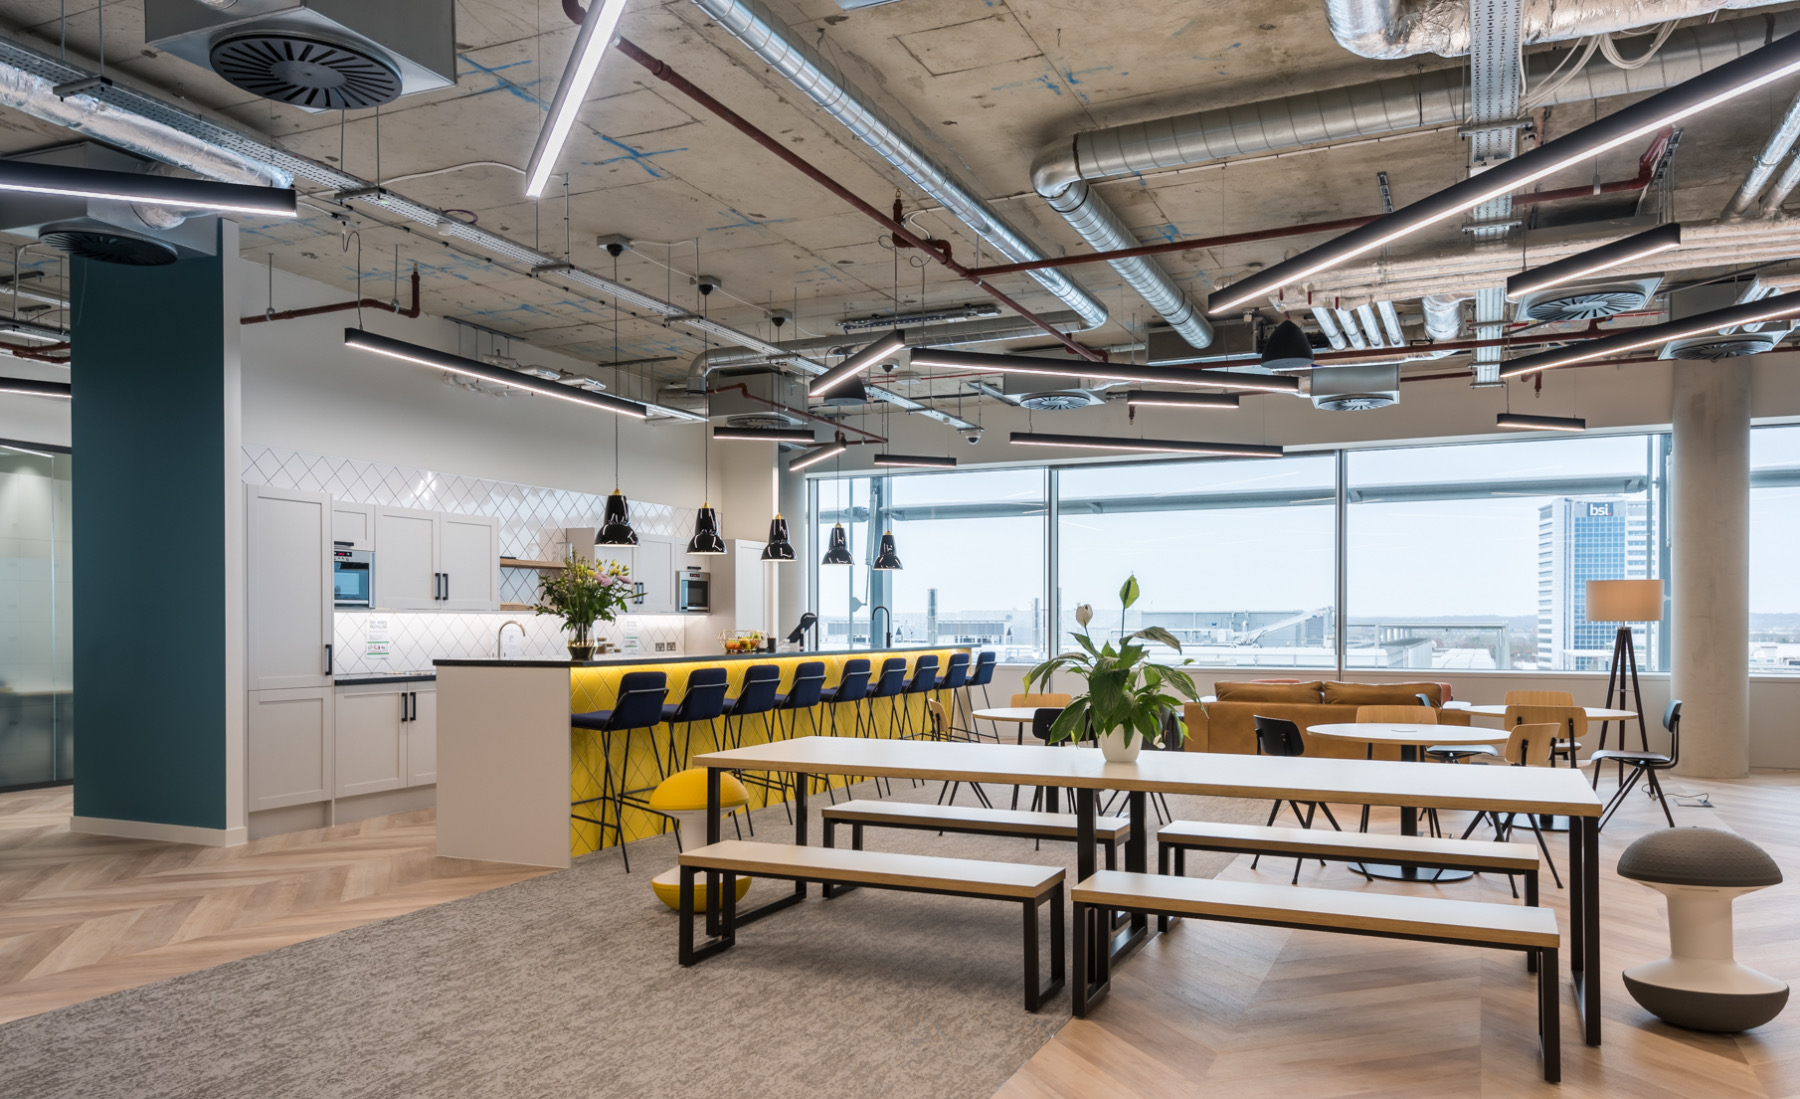 venture-x-london-coworking-space-2